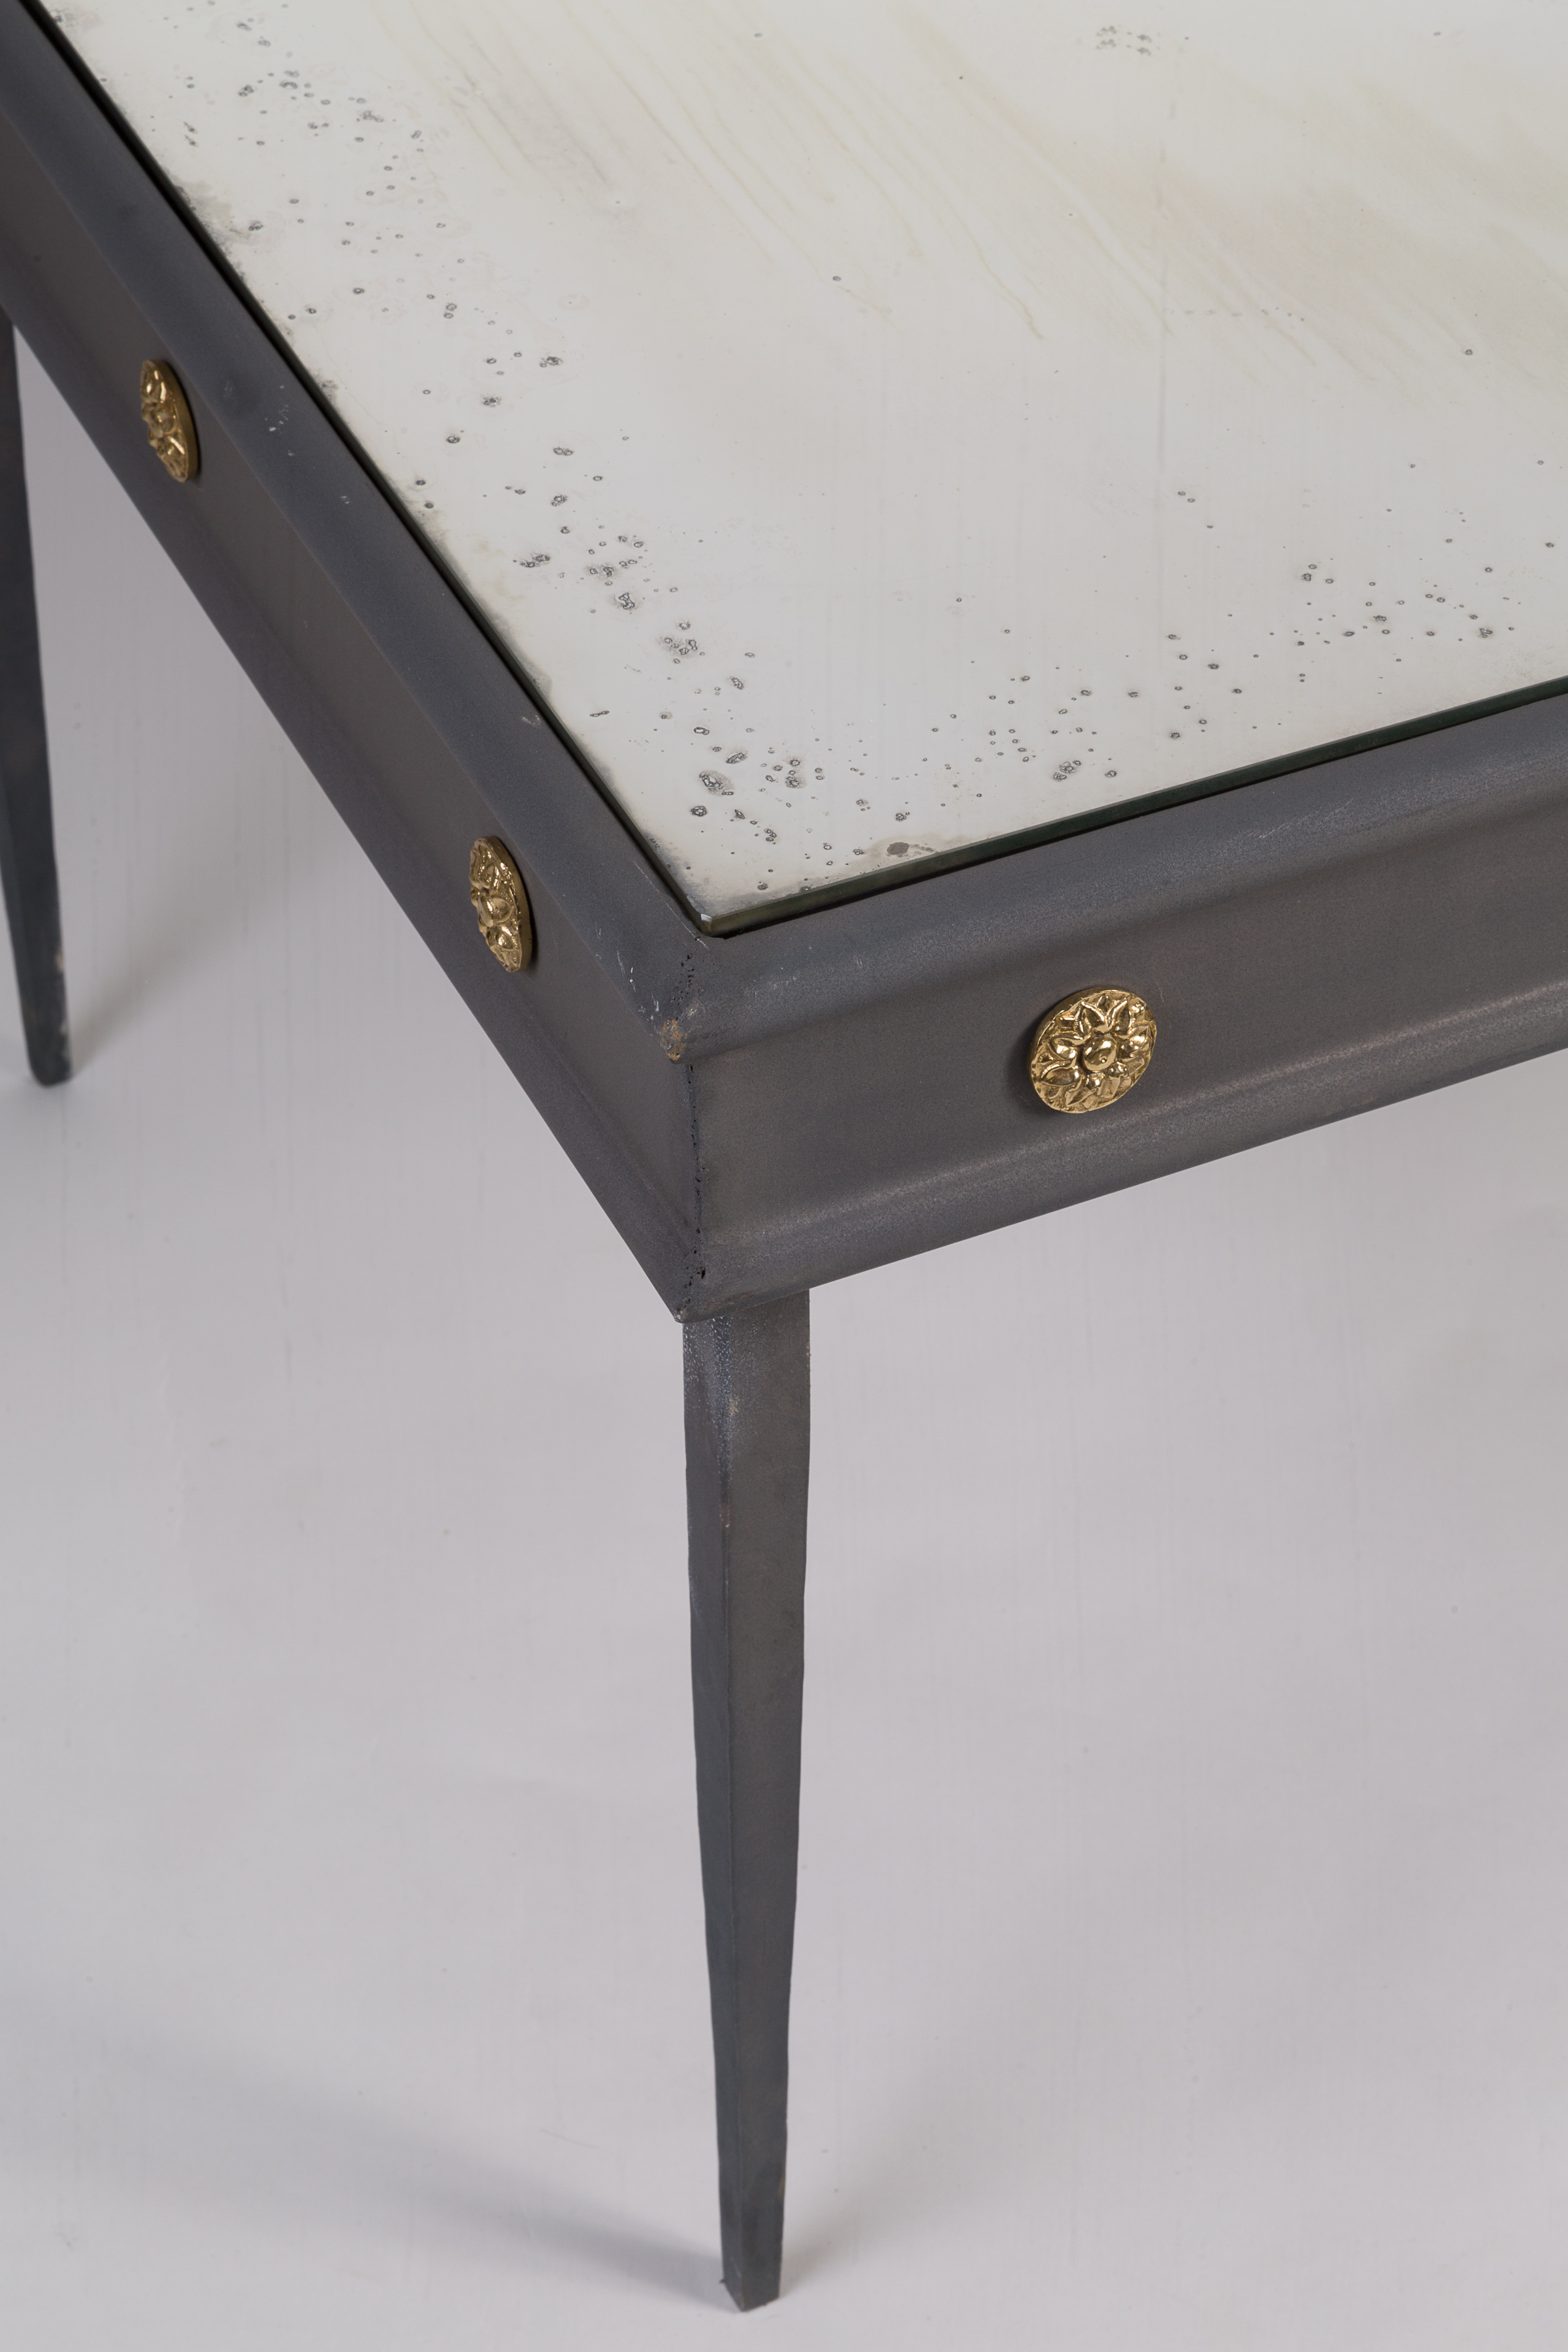 Lafayette coffee table detail